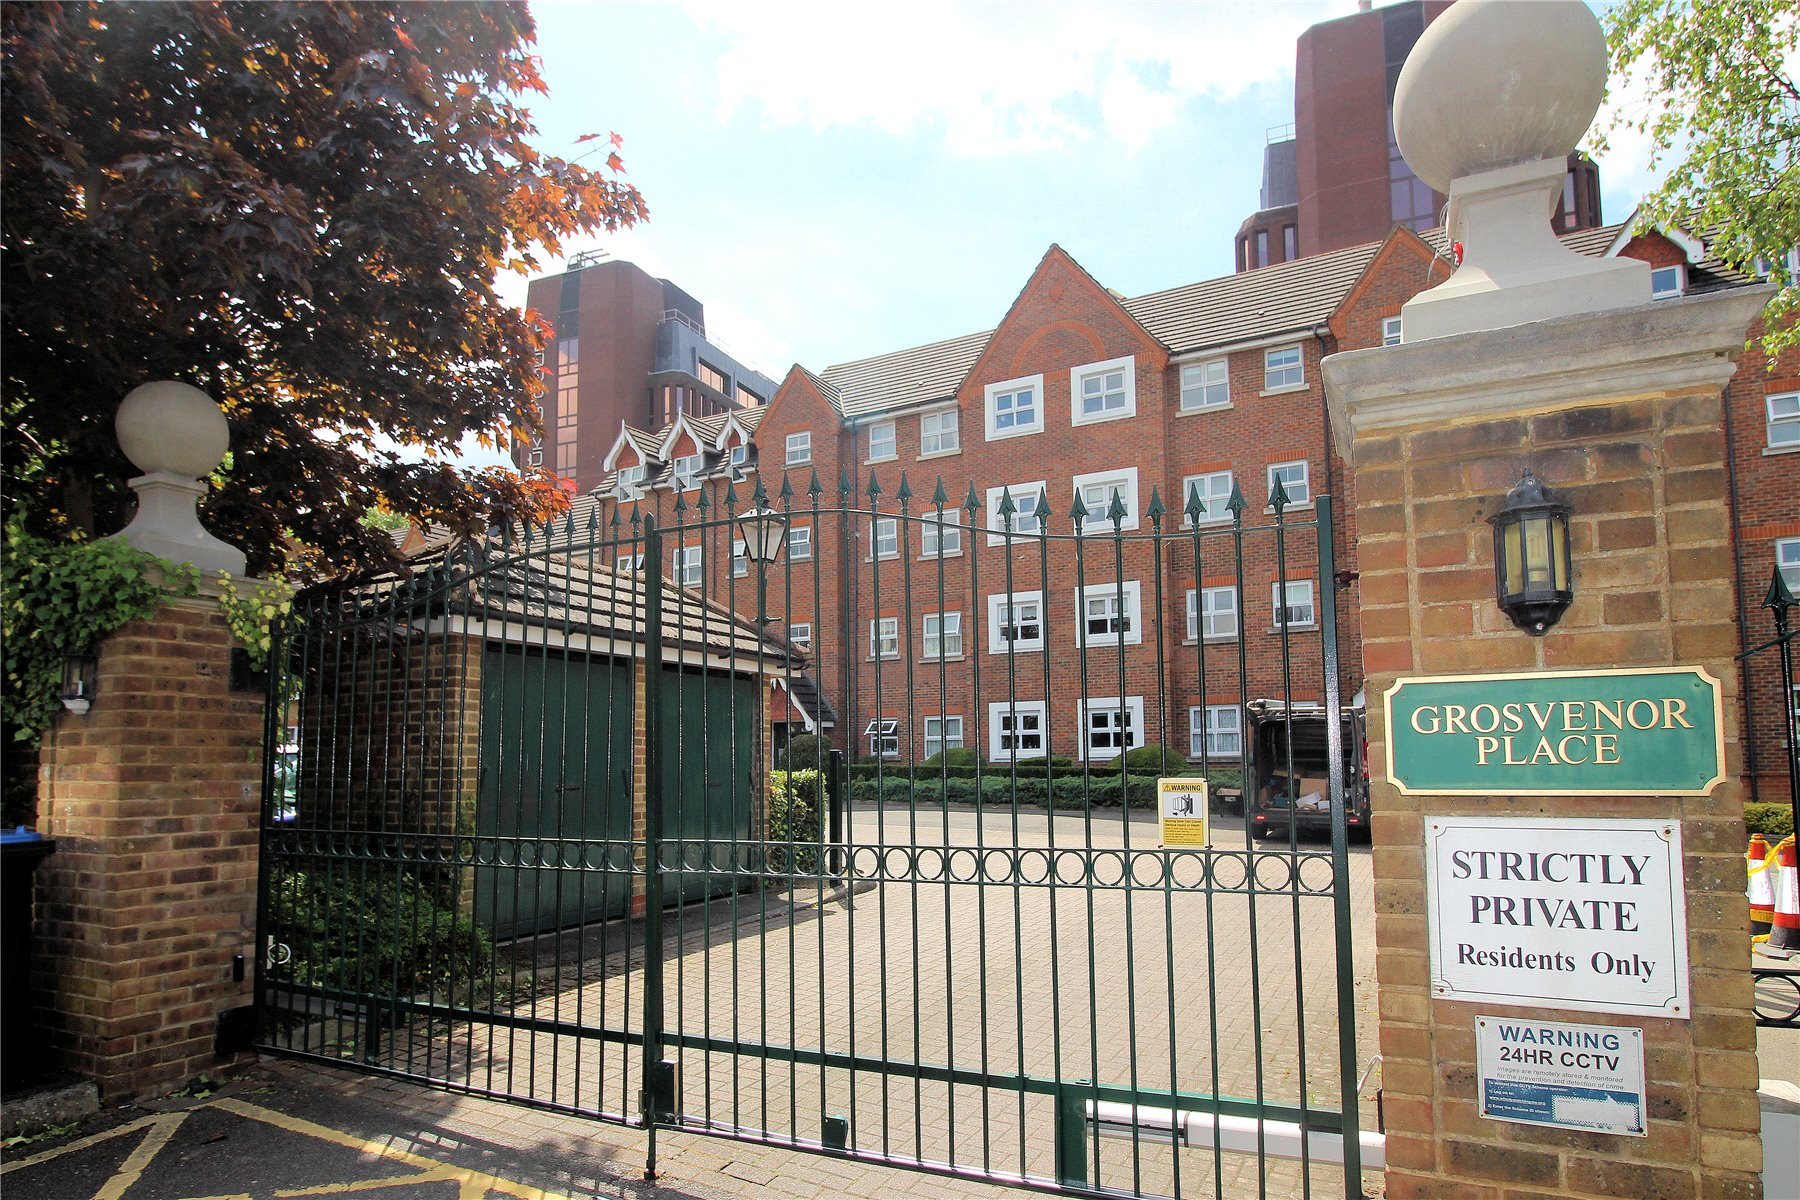 2 Bedrooms Apartment Flat for sale in Grosvenor Place, Burleigh Gardens, Woking, Surrey, GU21